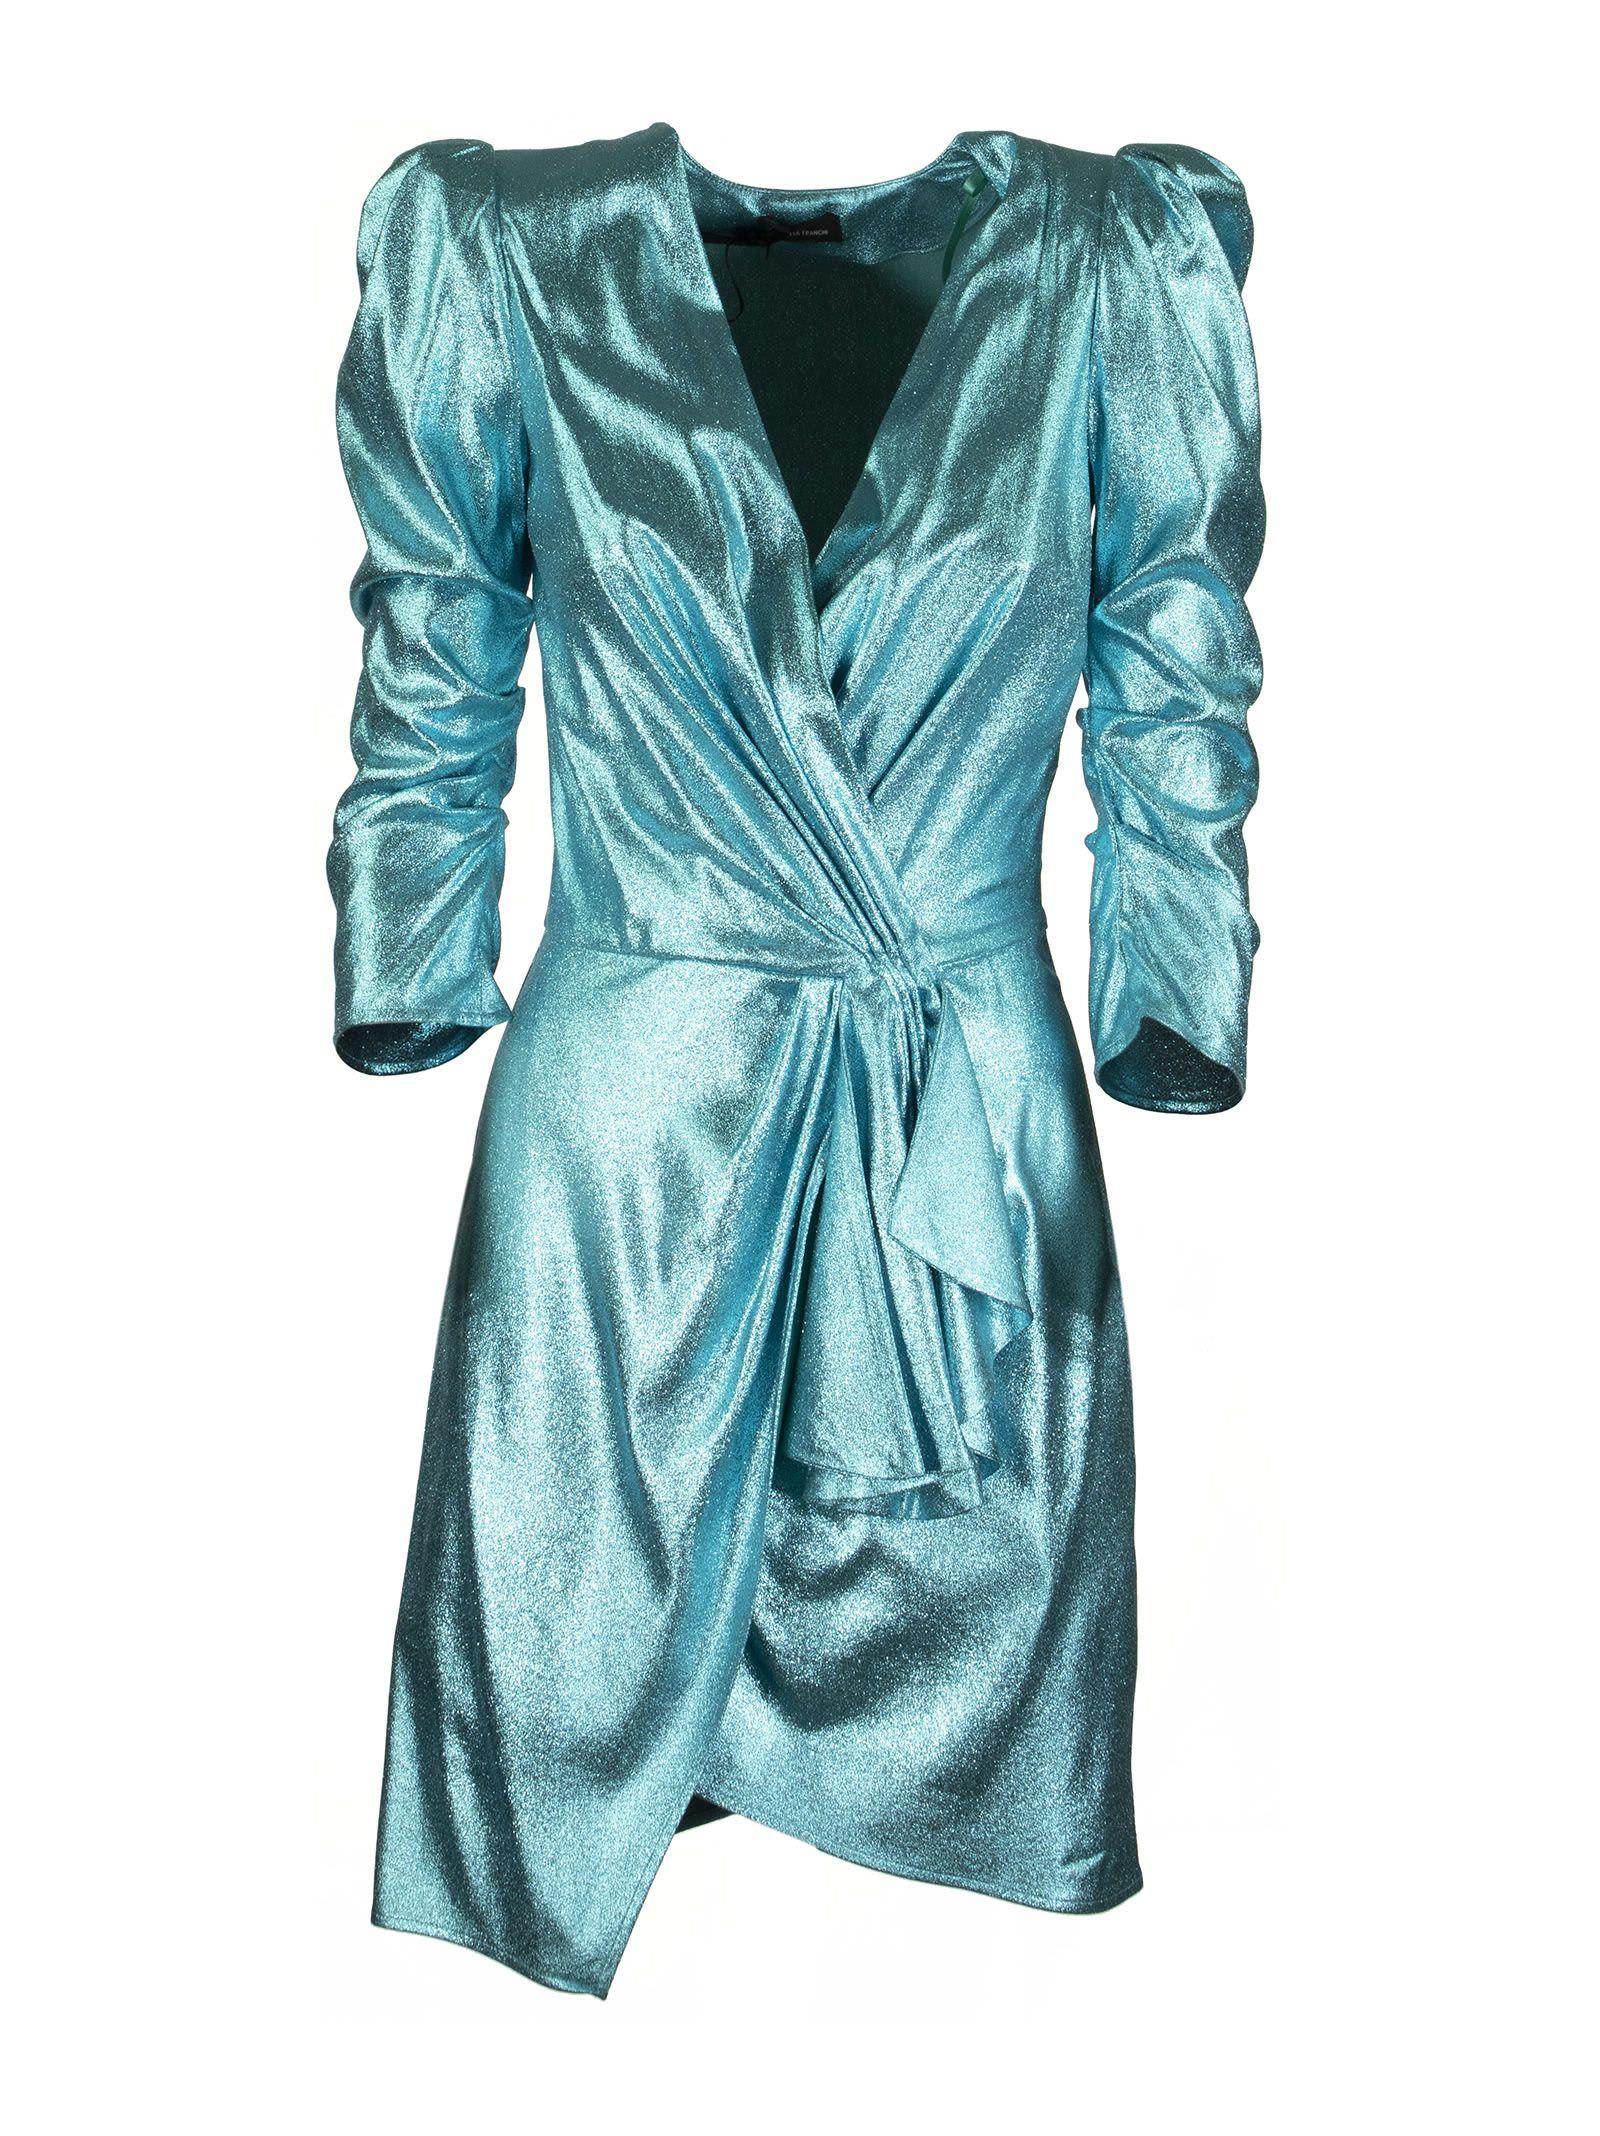 Buy Elisabetta Franchi Celyn B. Short Dress With Balloon Sleeves online, shop Elisabetta Franchi Celyn B. with free shipping